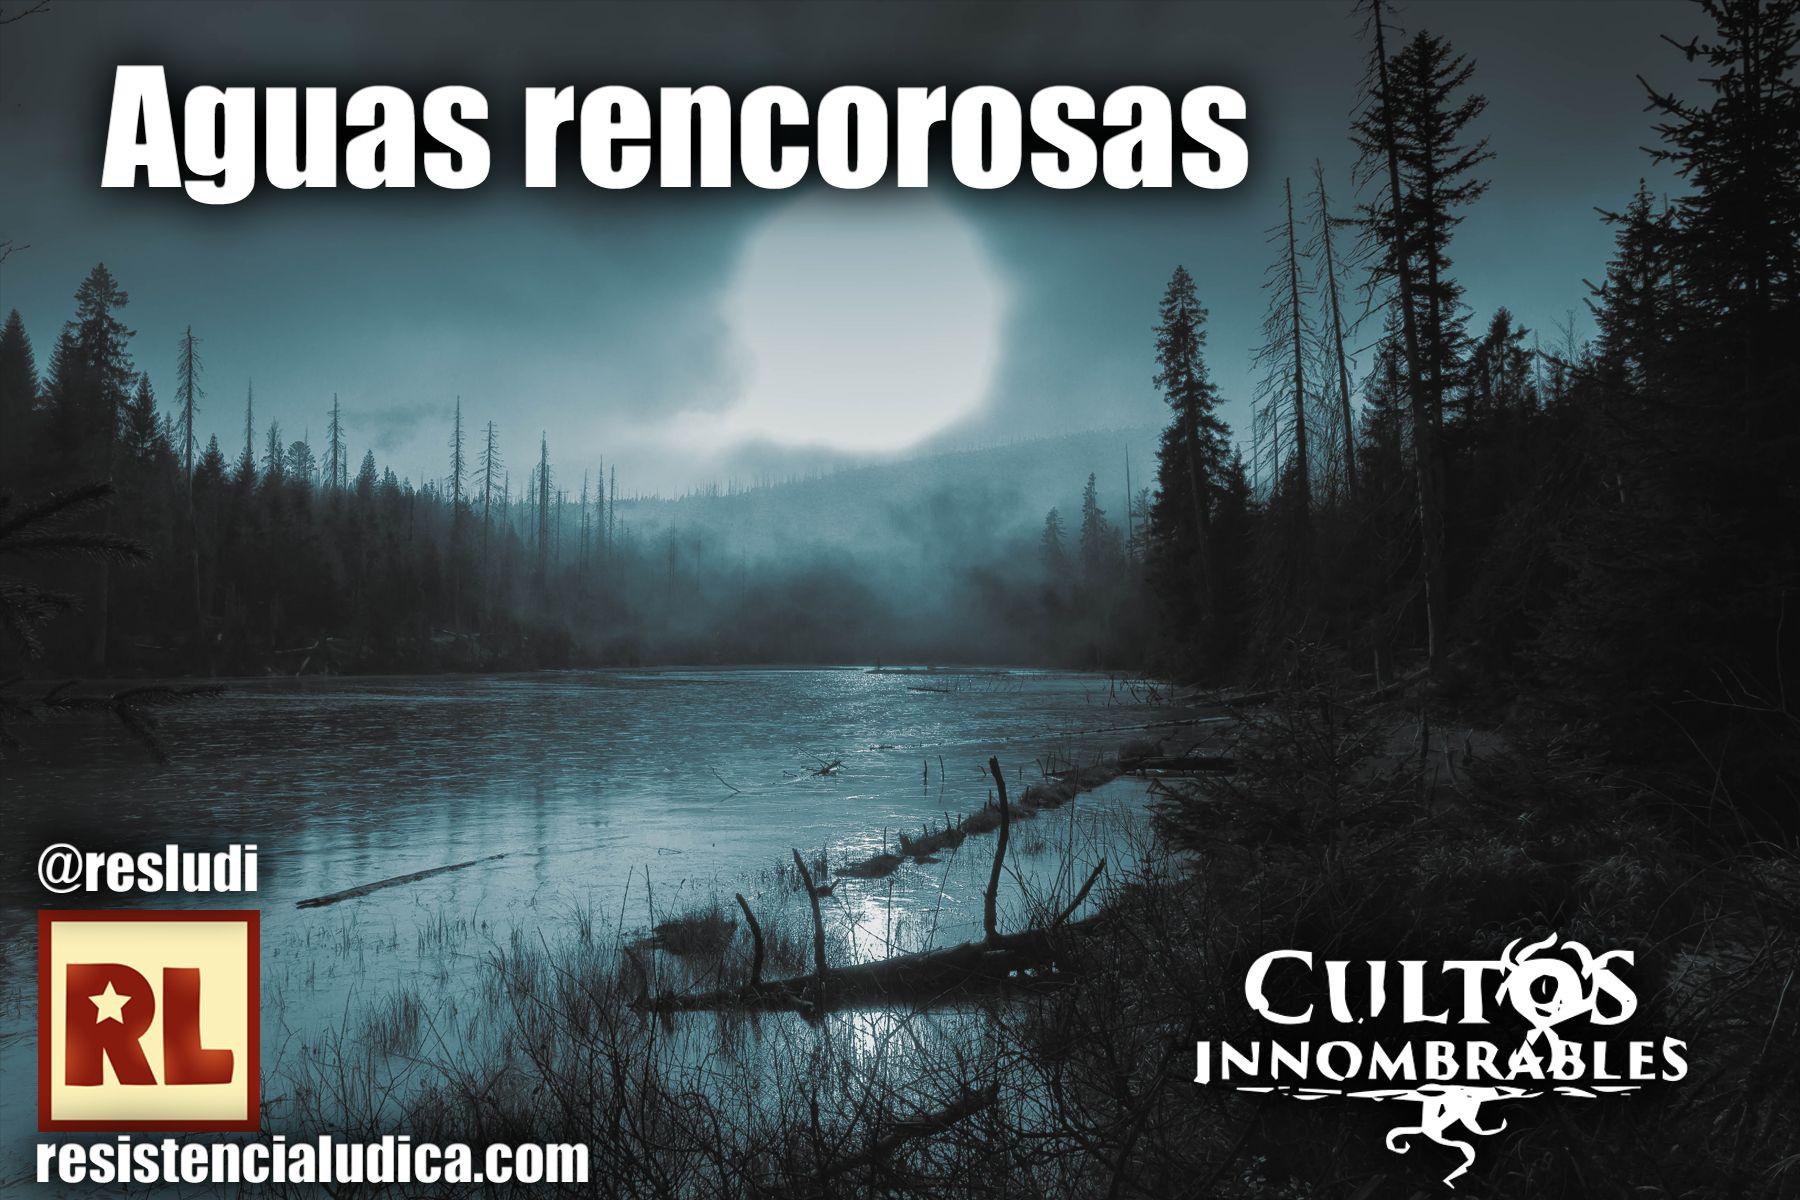 Rol - Aguas rencorosas (Cultos Innombrables) RL